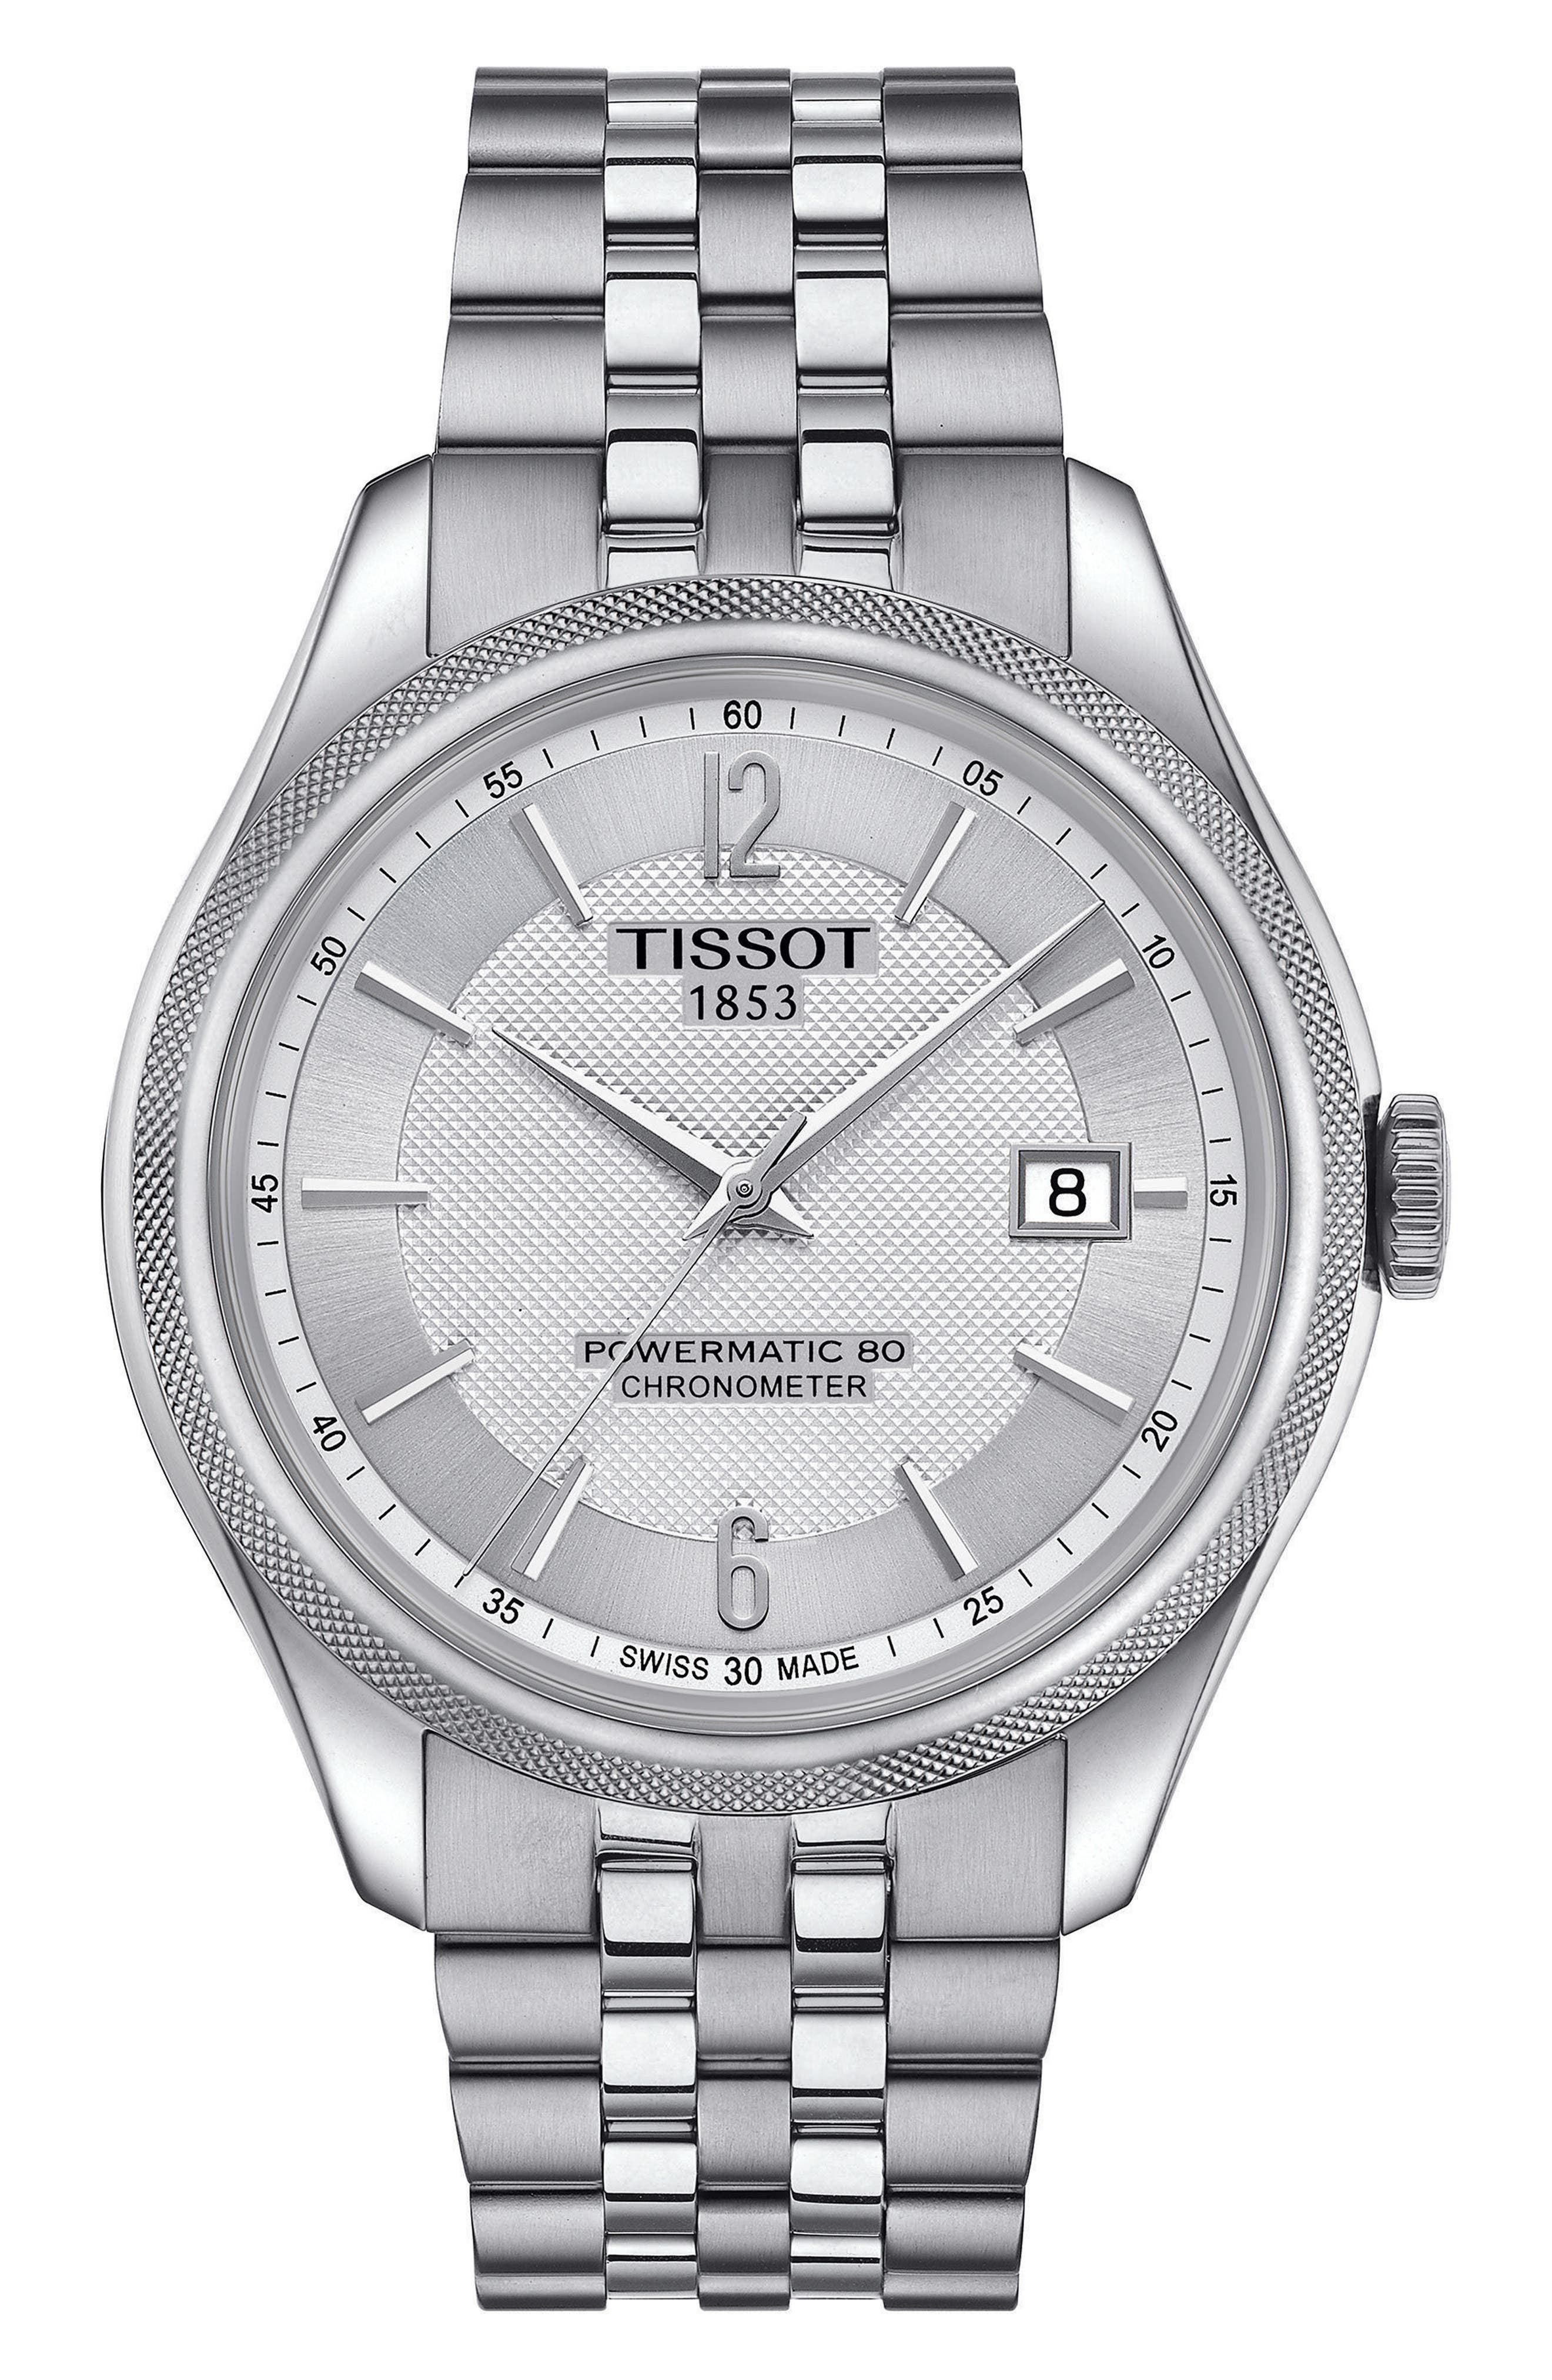 Main Image - Tissot Ballade Powermatic 80 Chronometer Bracelet Watch, 39mm x 41mm